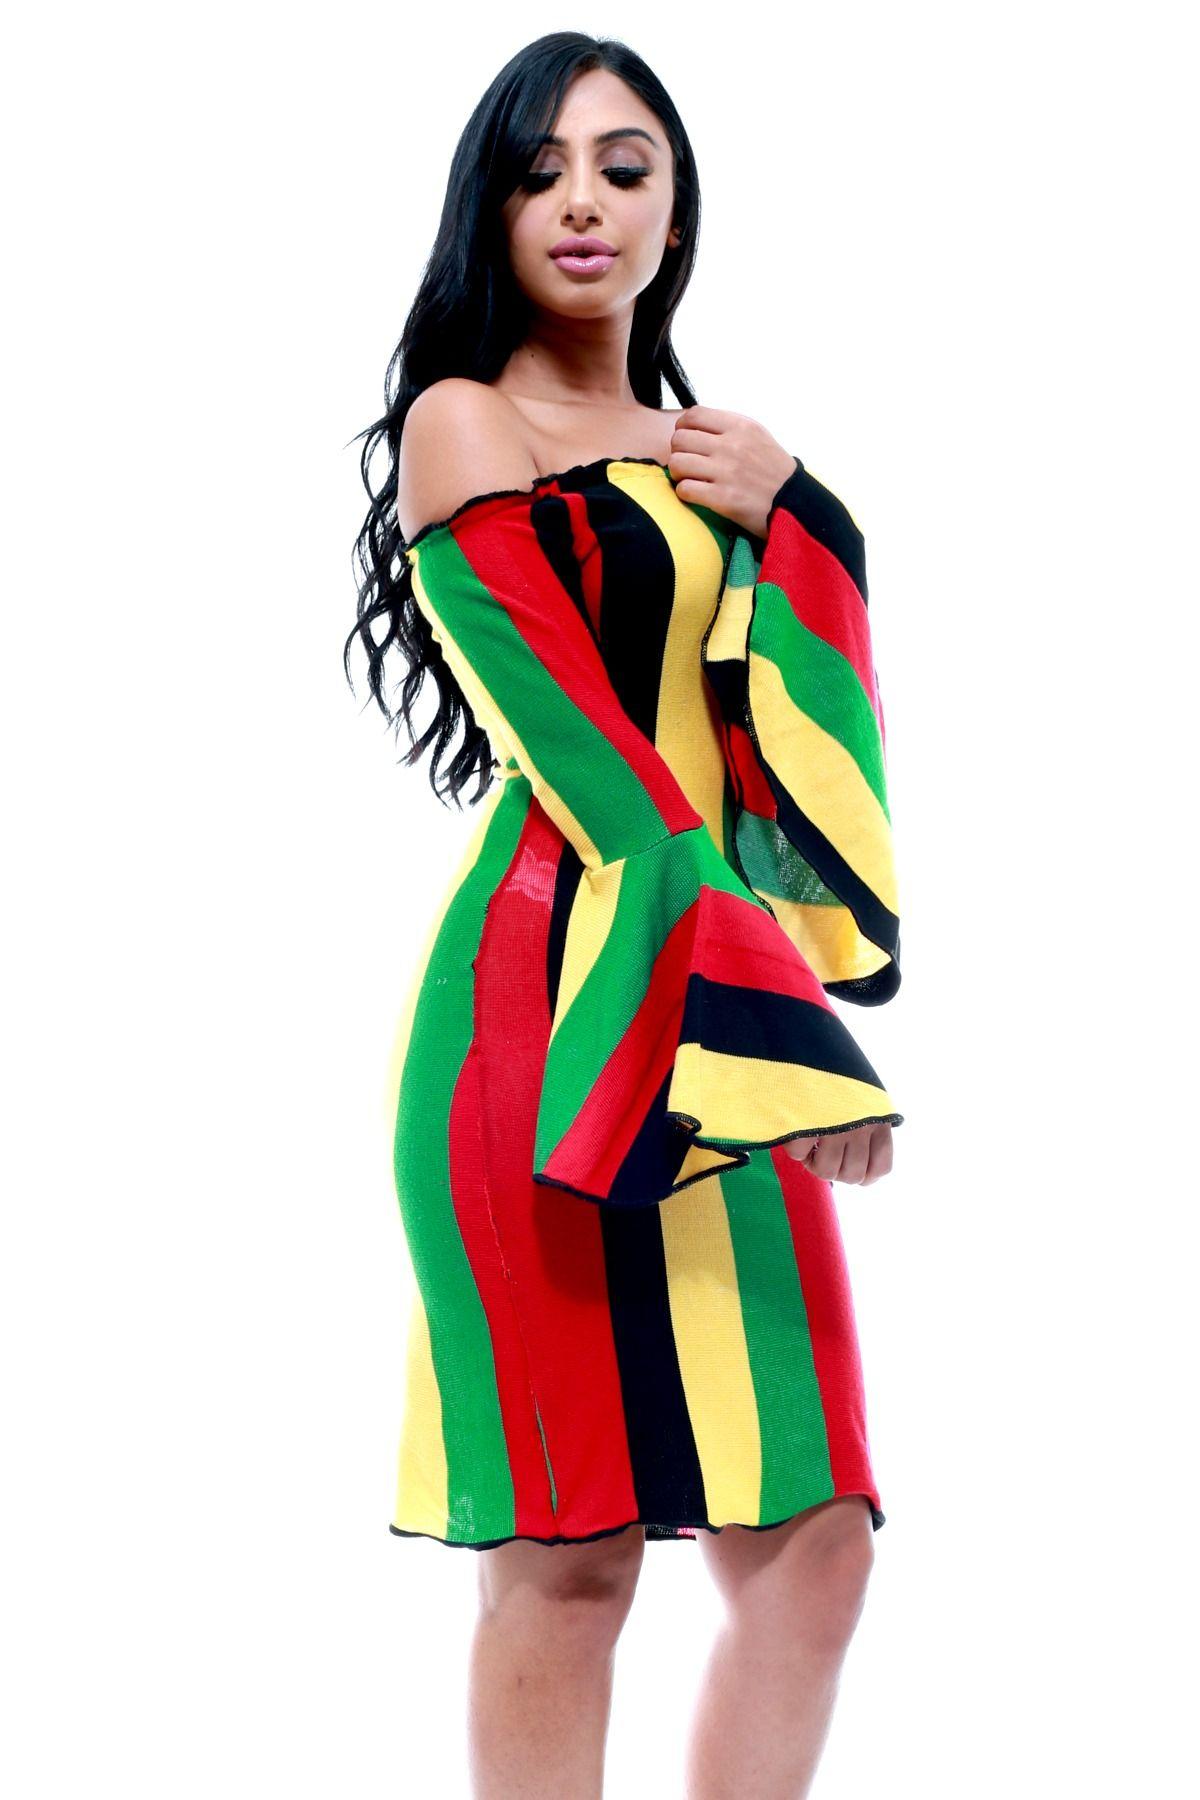 8718581a77 Rasta Dress Jamaican Clothing Trend is Back | Fashion | Rasta dress ...